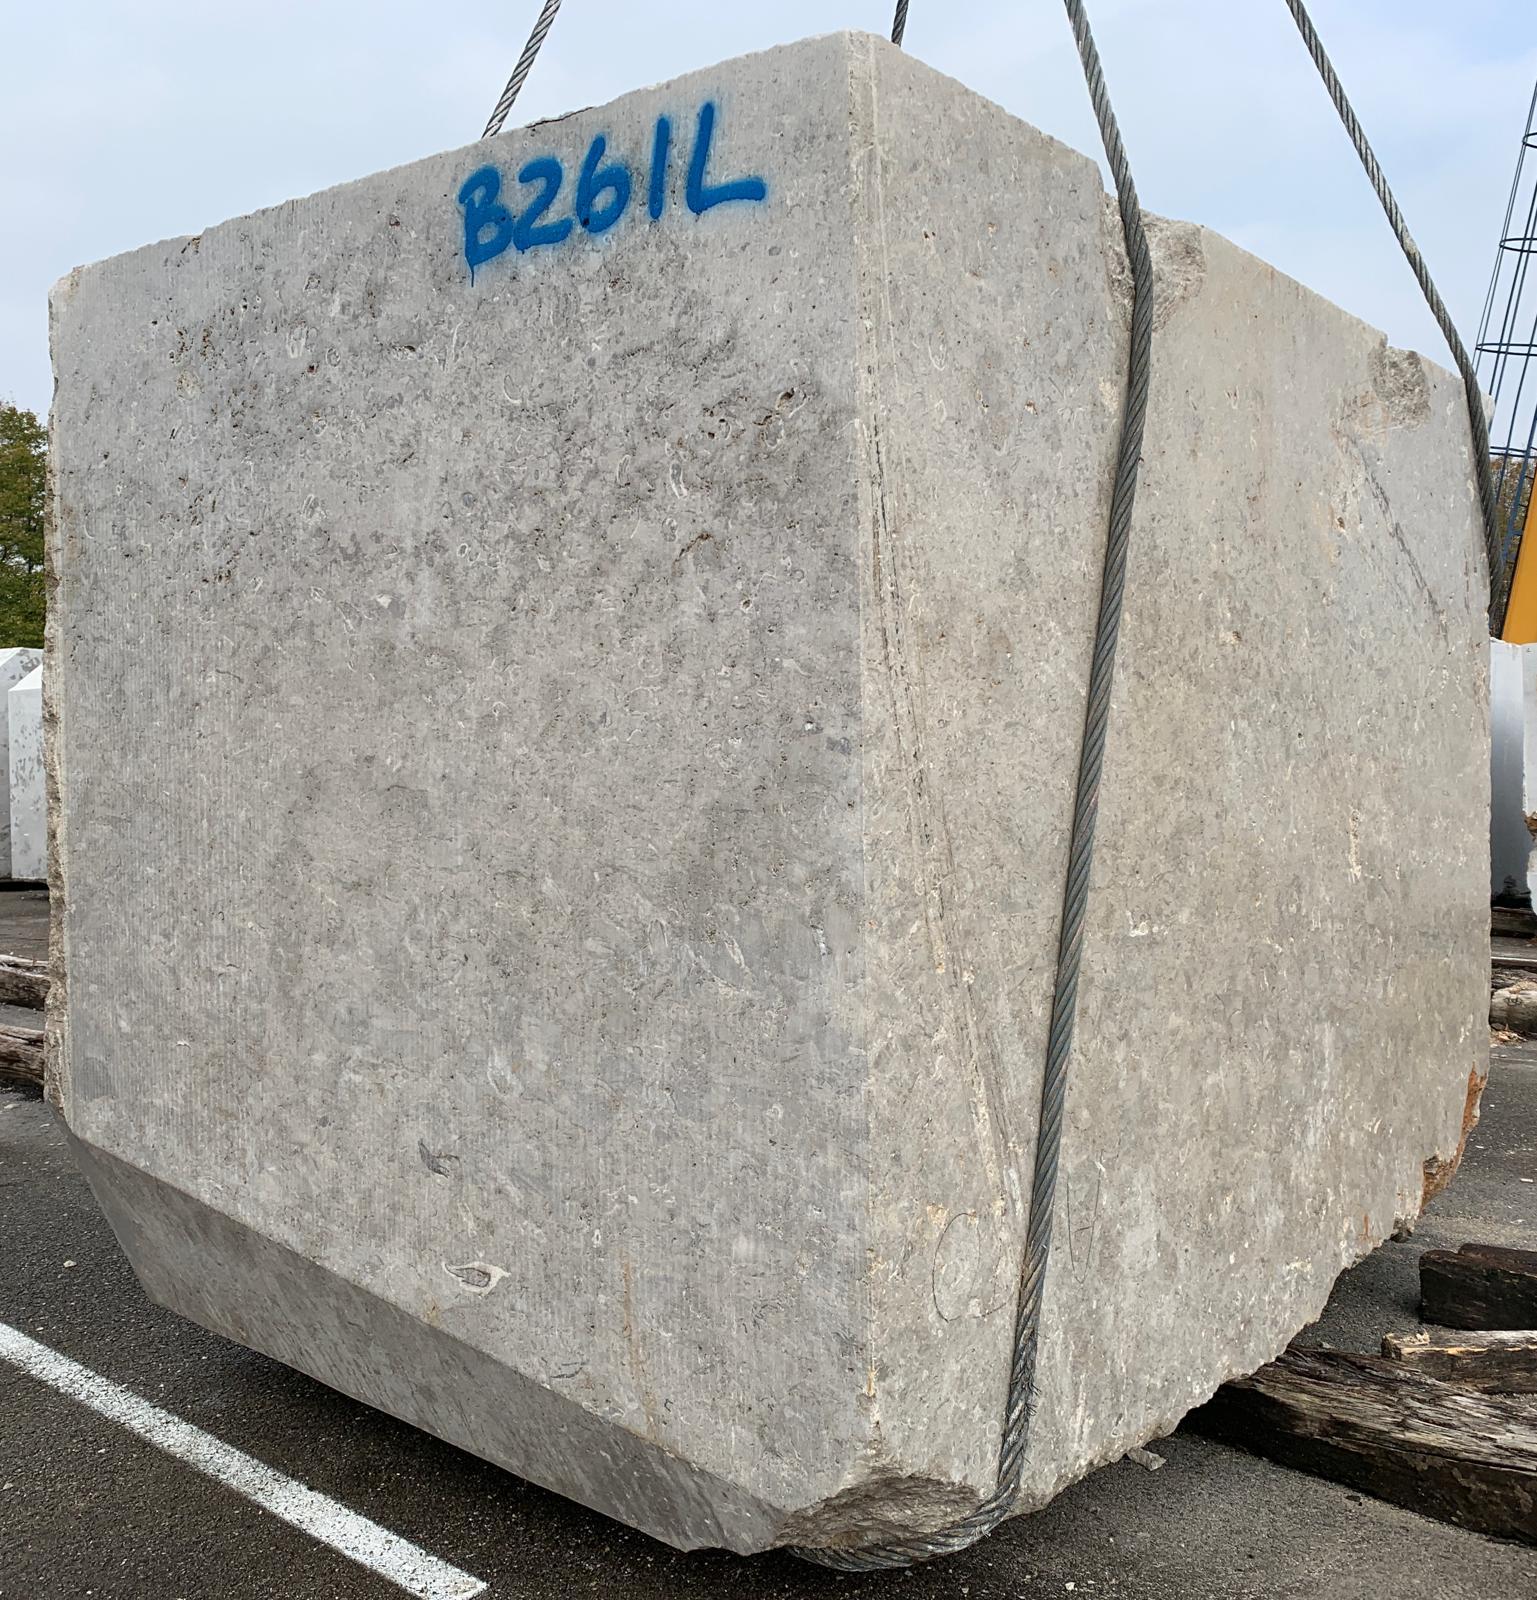 B261L - 300x170x160cm - 21.62tn (1)